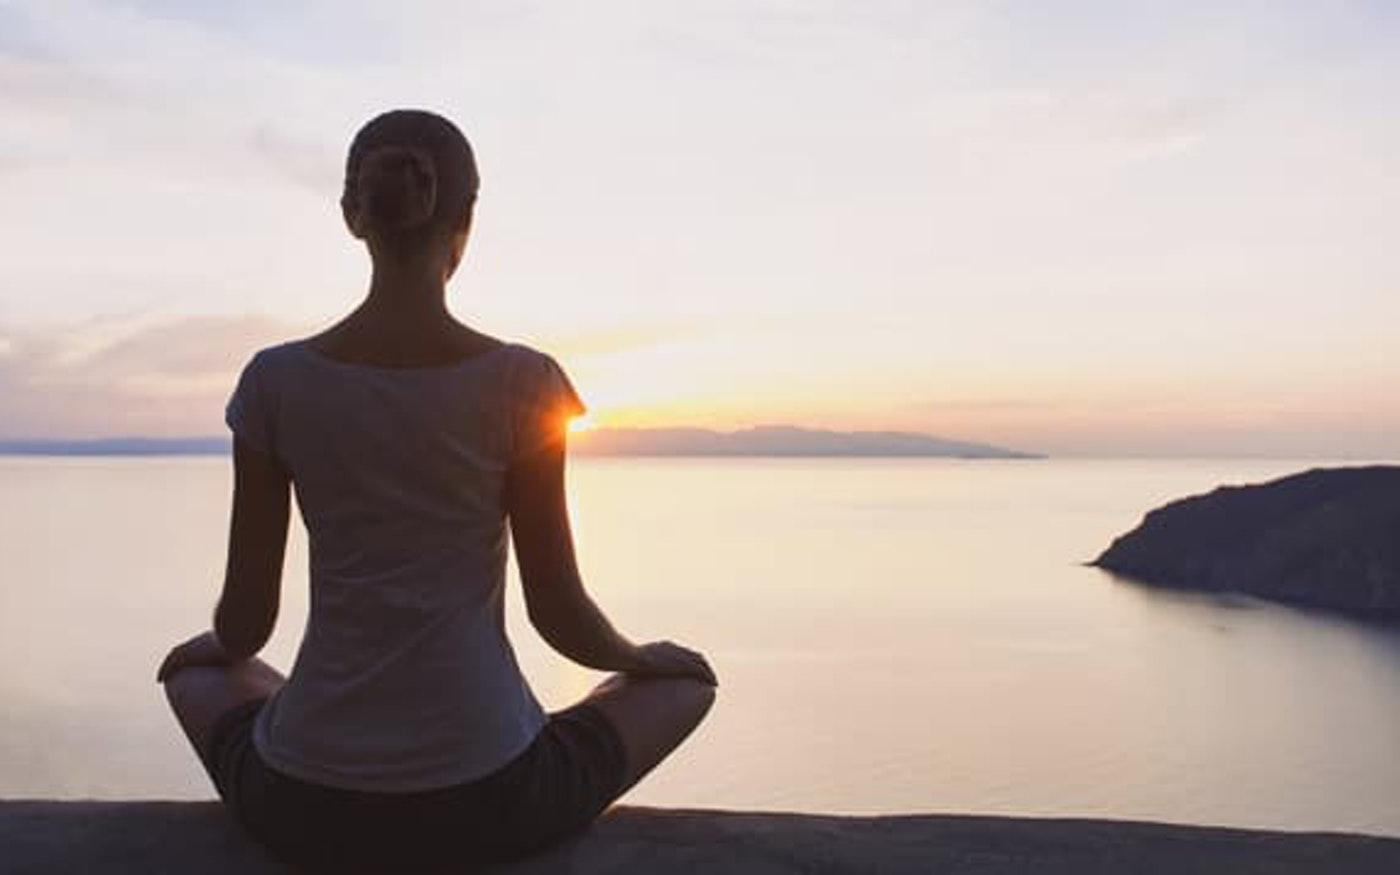 Hyatt Hotels debuts meditation and mindfulness